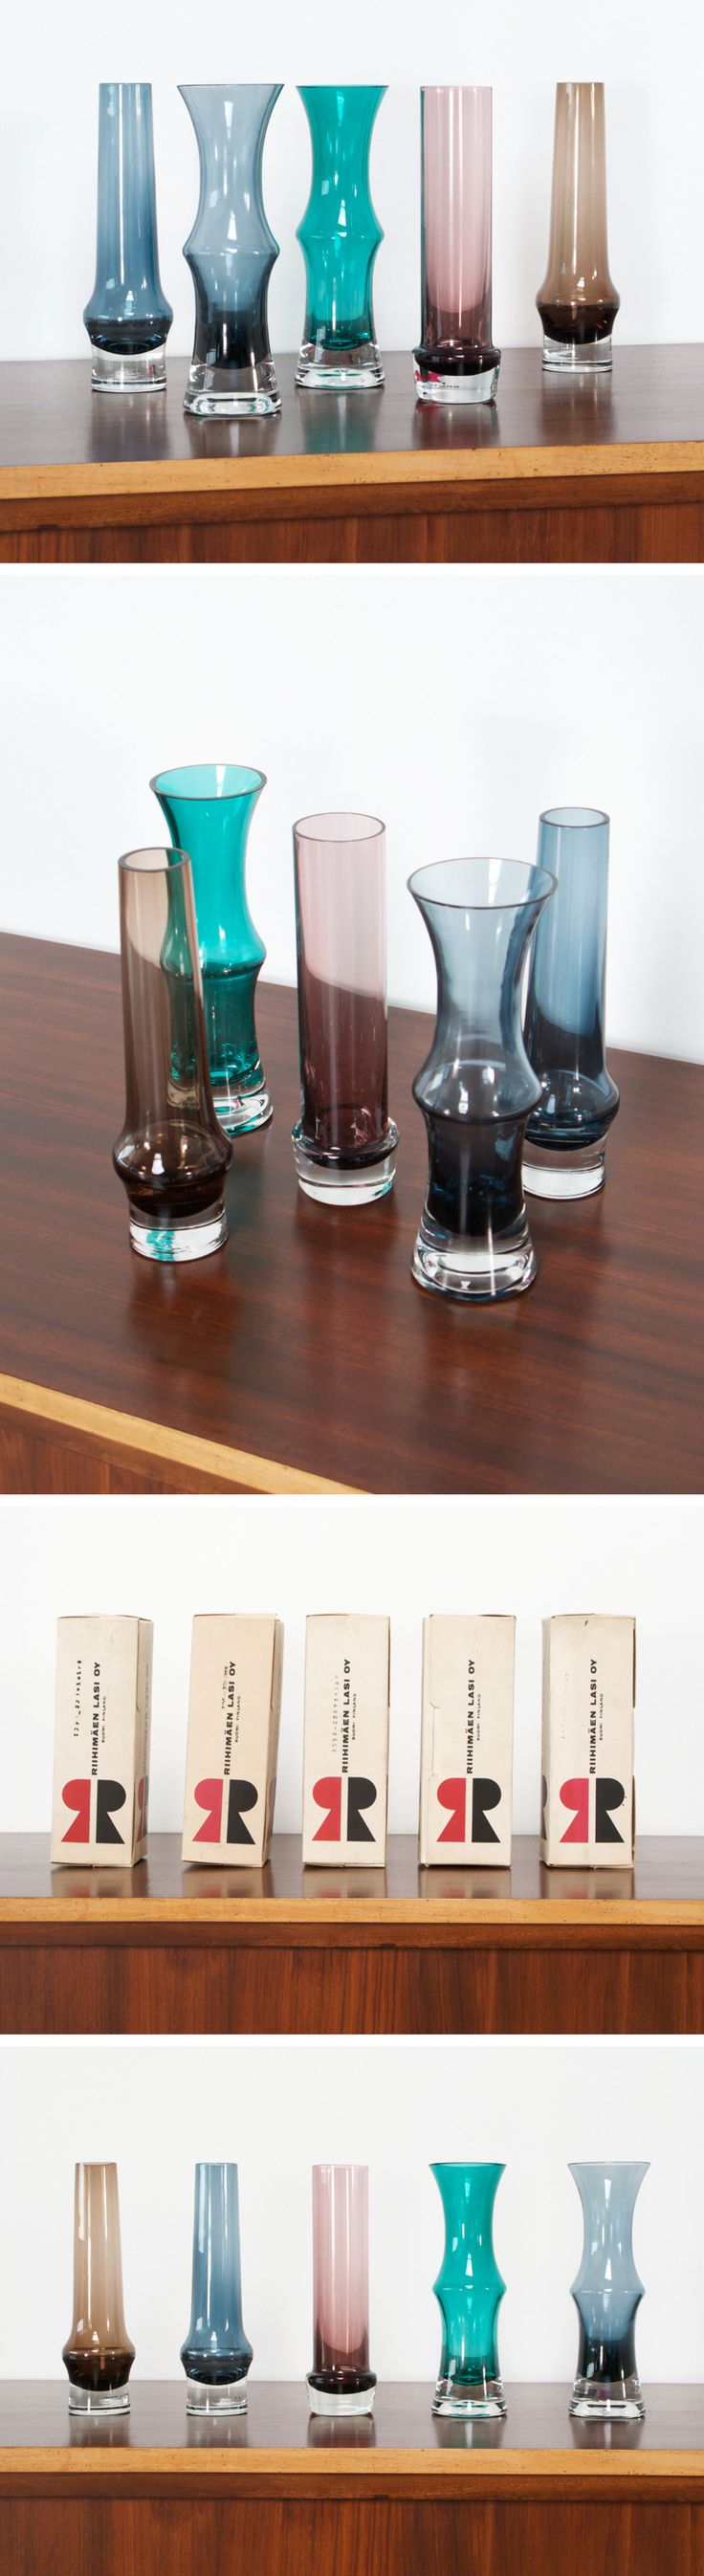 Riihimaen Lasi Oy 5 Riihimaki glass works Tamara Aladin